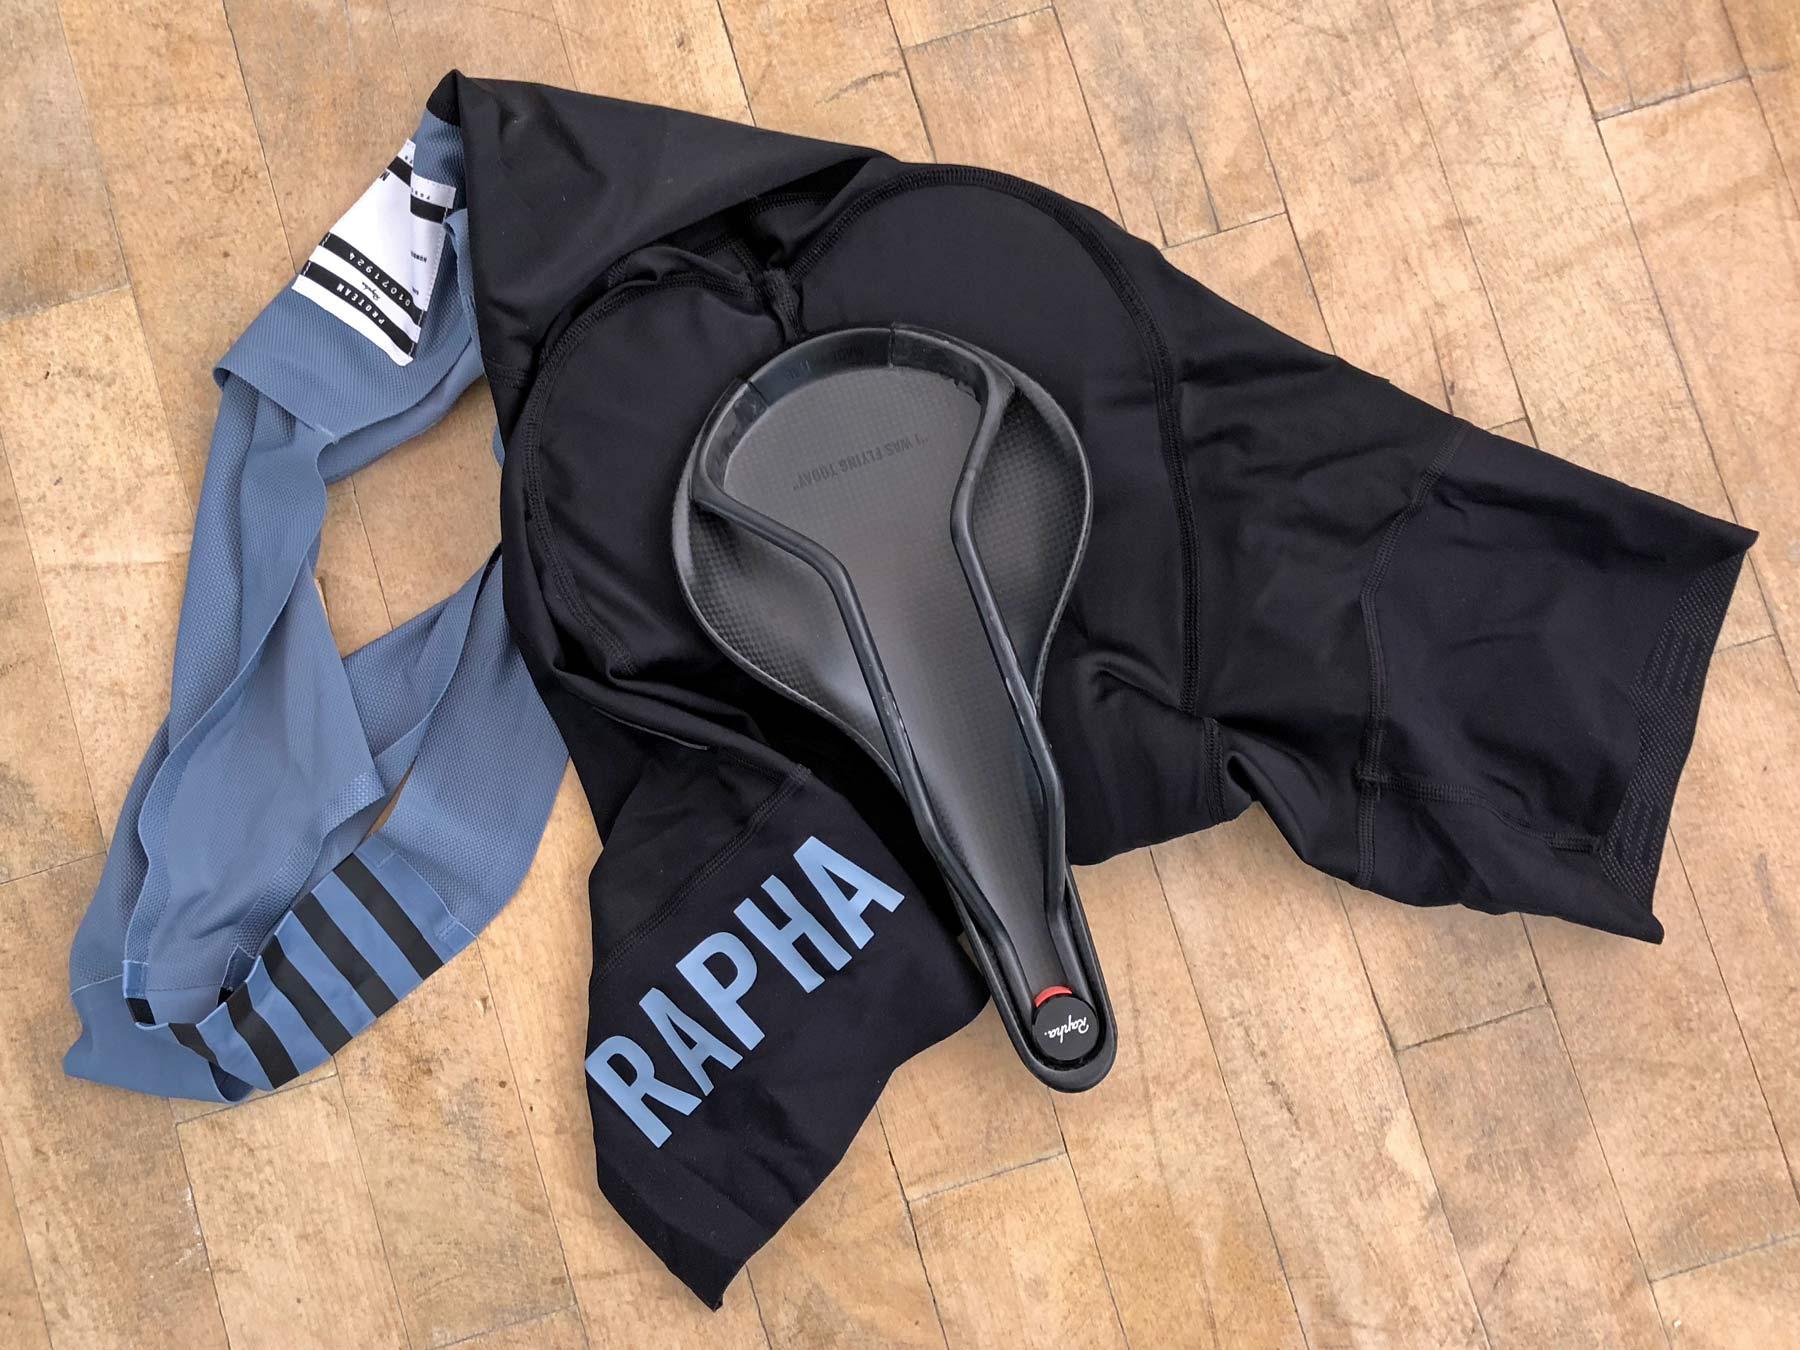 ... splash of pink may be the hallmark of Rapha s premium clothing fb774c60d